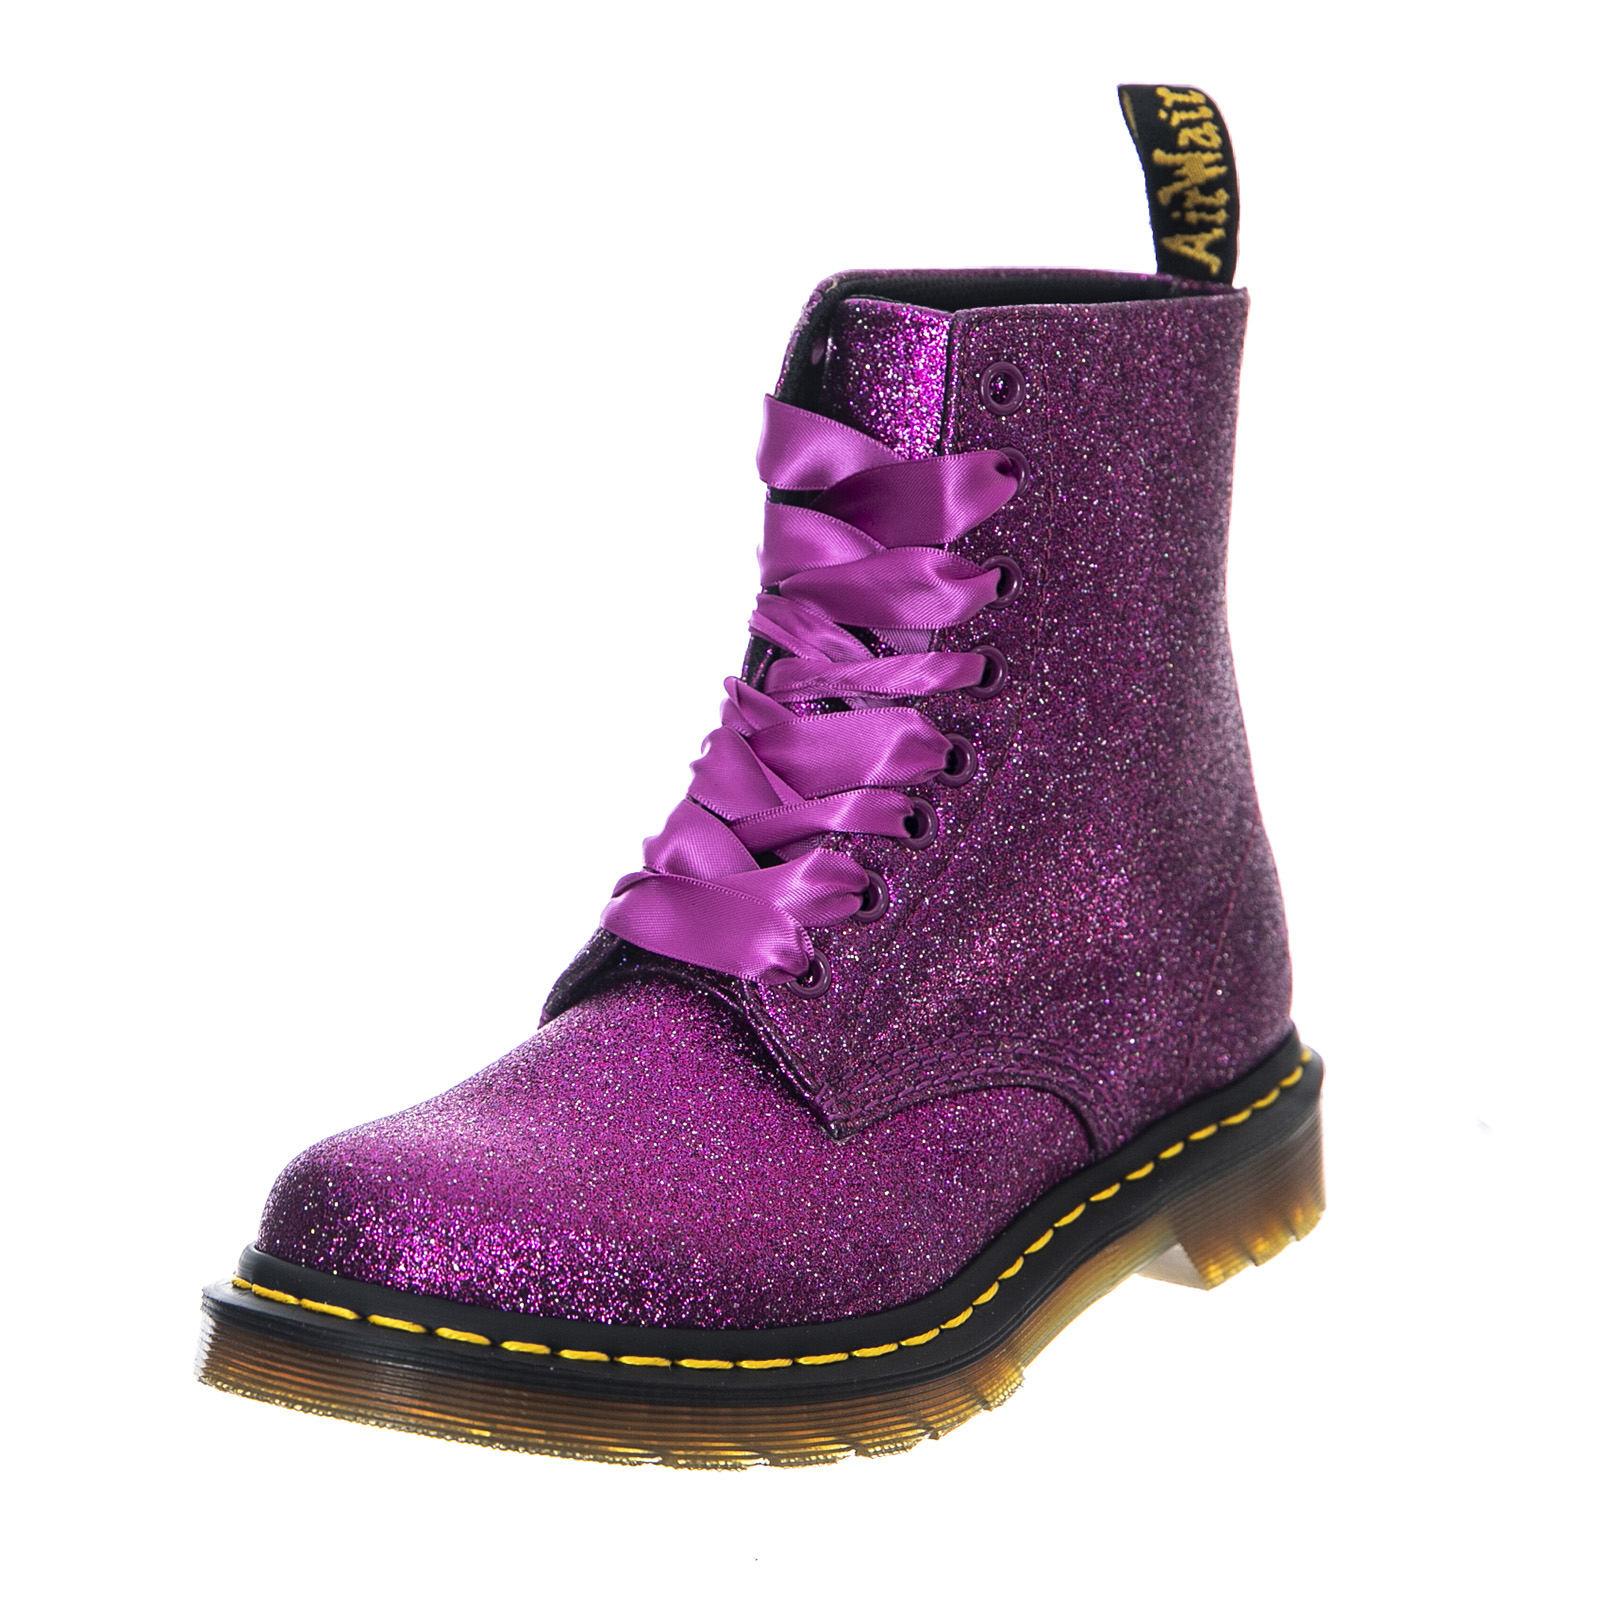 1460 Pascal Glitter | Saldi | Stivali, Scarpe e Accessori di